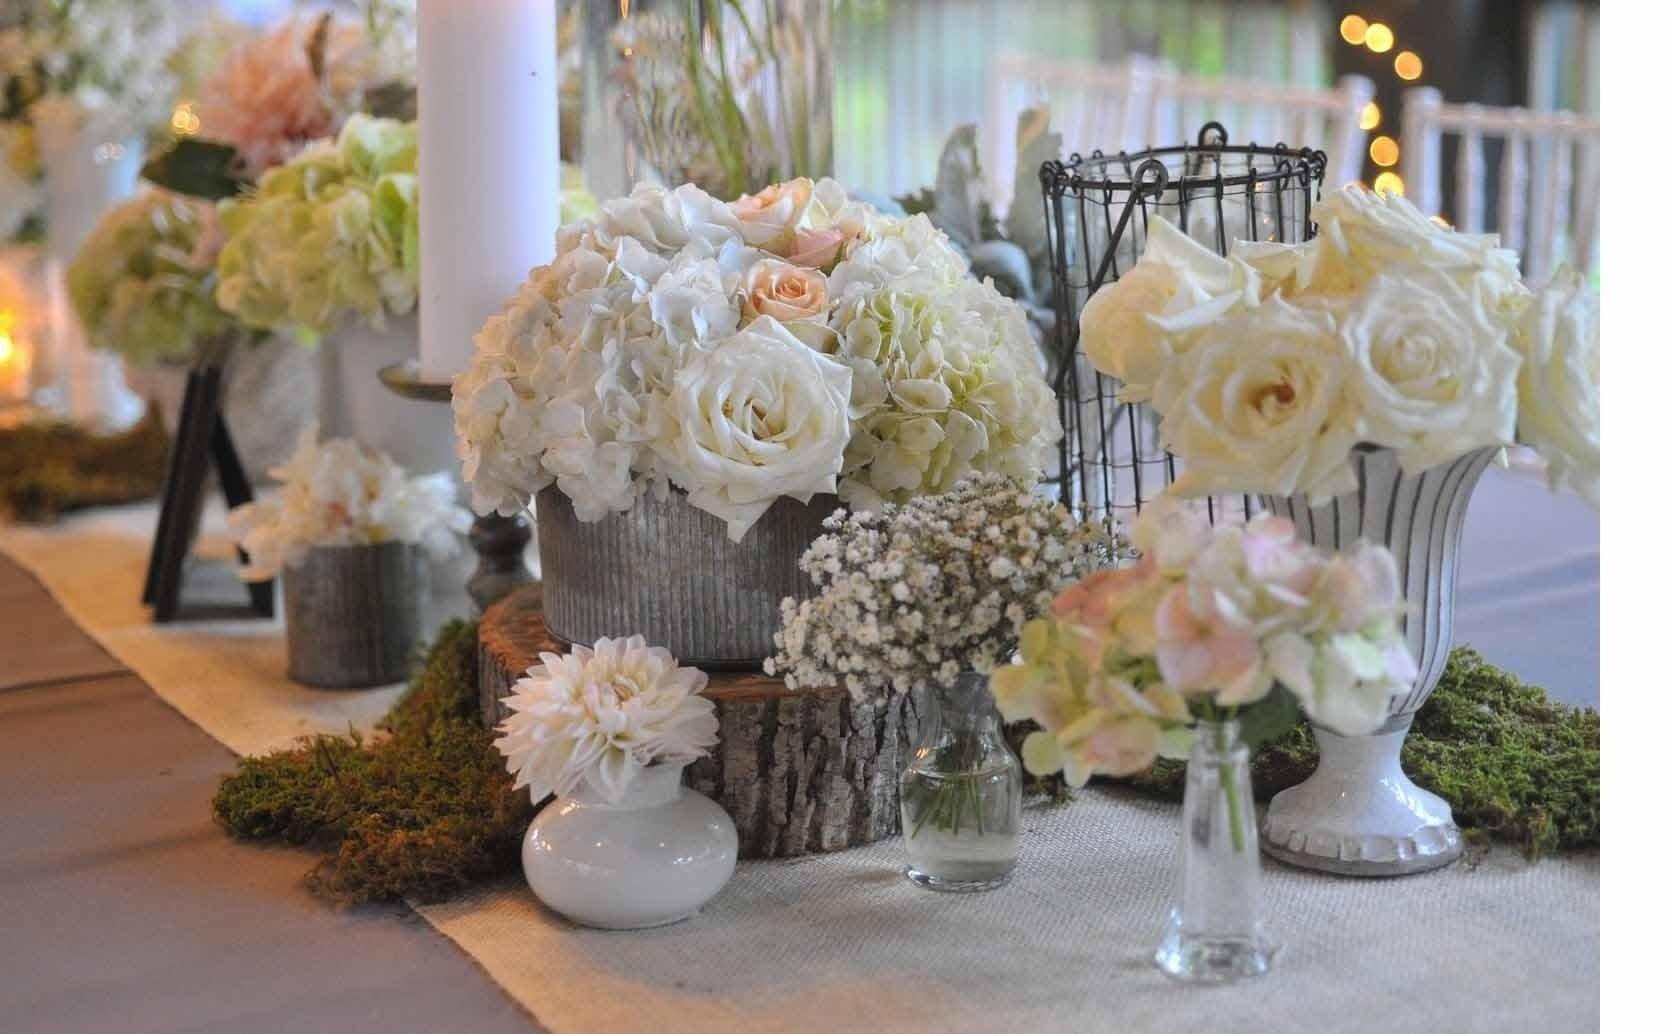 10 Unique Wedding Flowers And Reception Ideas wedding decoration ideas modern vintage wedding reception ideas 2020